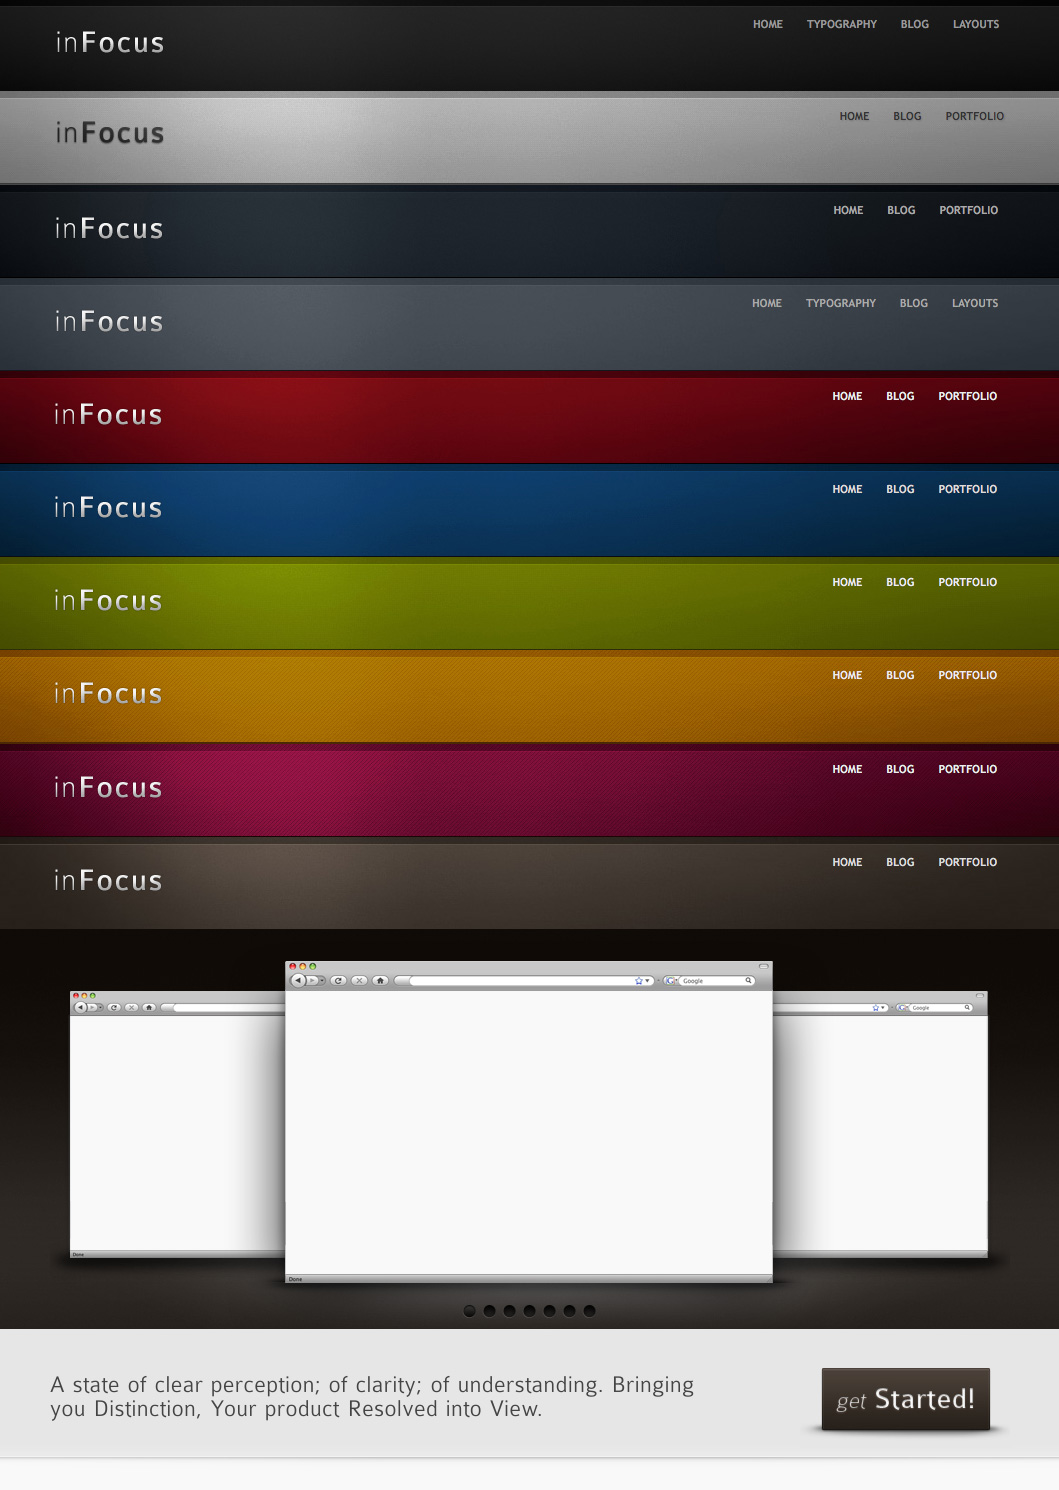 inFocus - Powerful Professional HTML CSS Theme